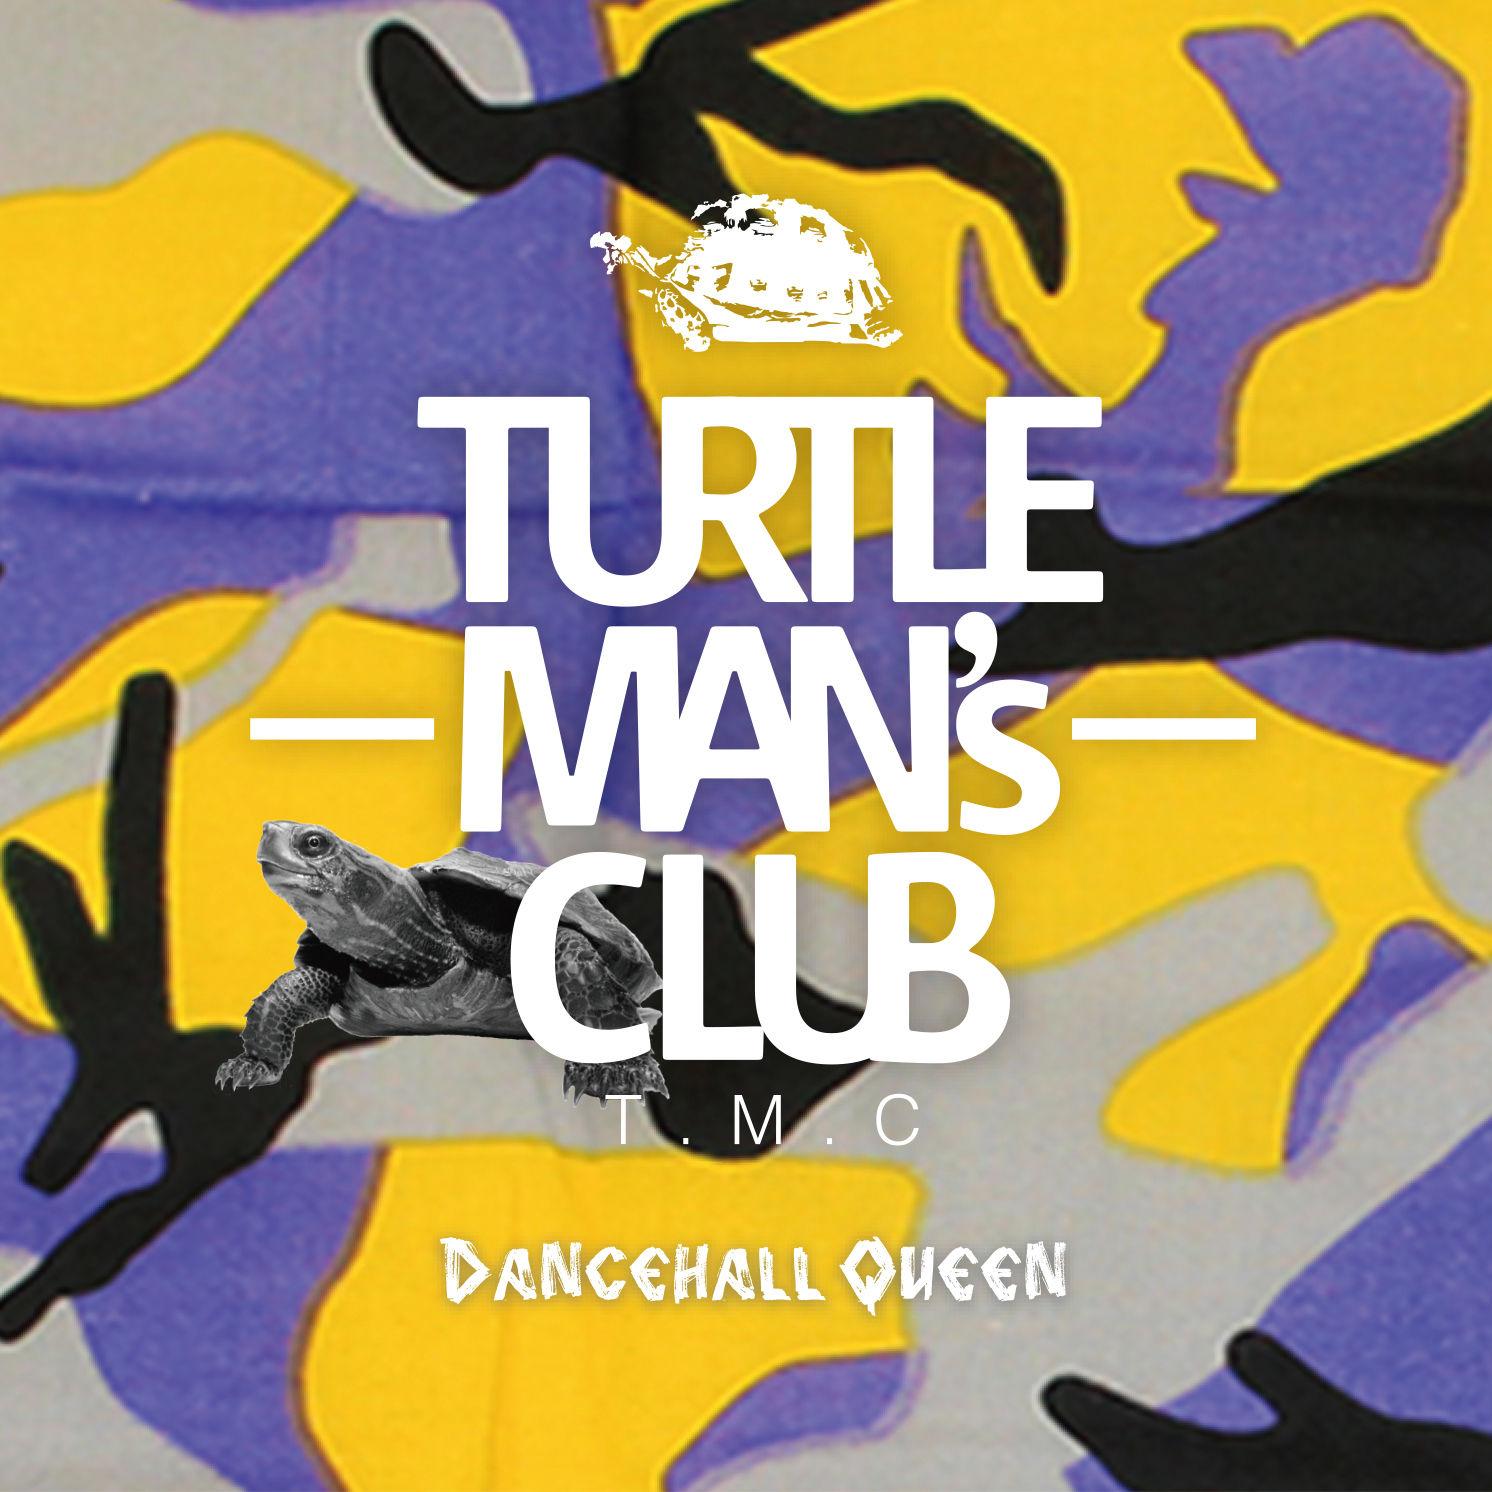 TURTLE MAN'S CLUB / DANCEHALL QUEEN